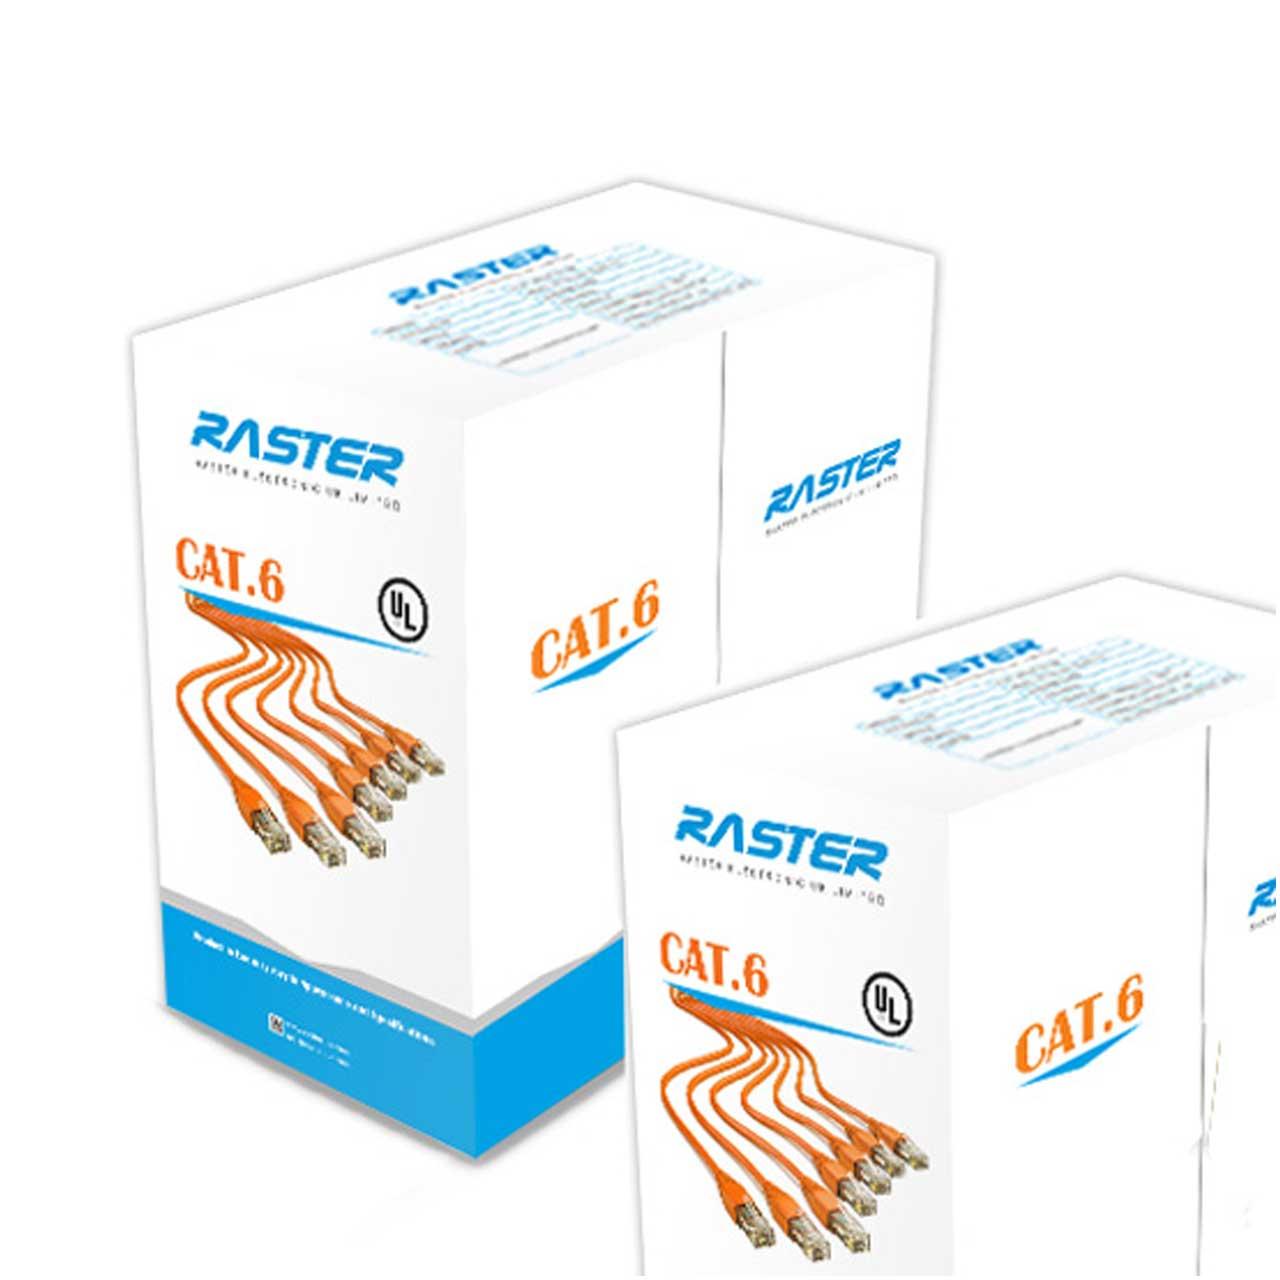 کابل شبکه Cat 6 UTP رستر Raster حلقه ای